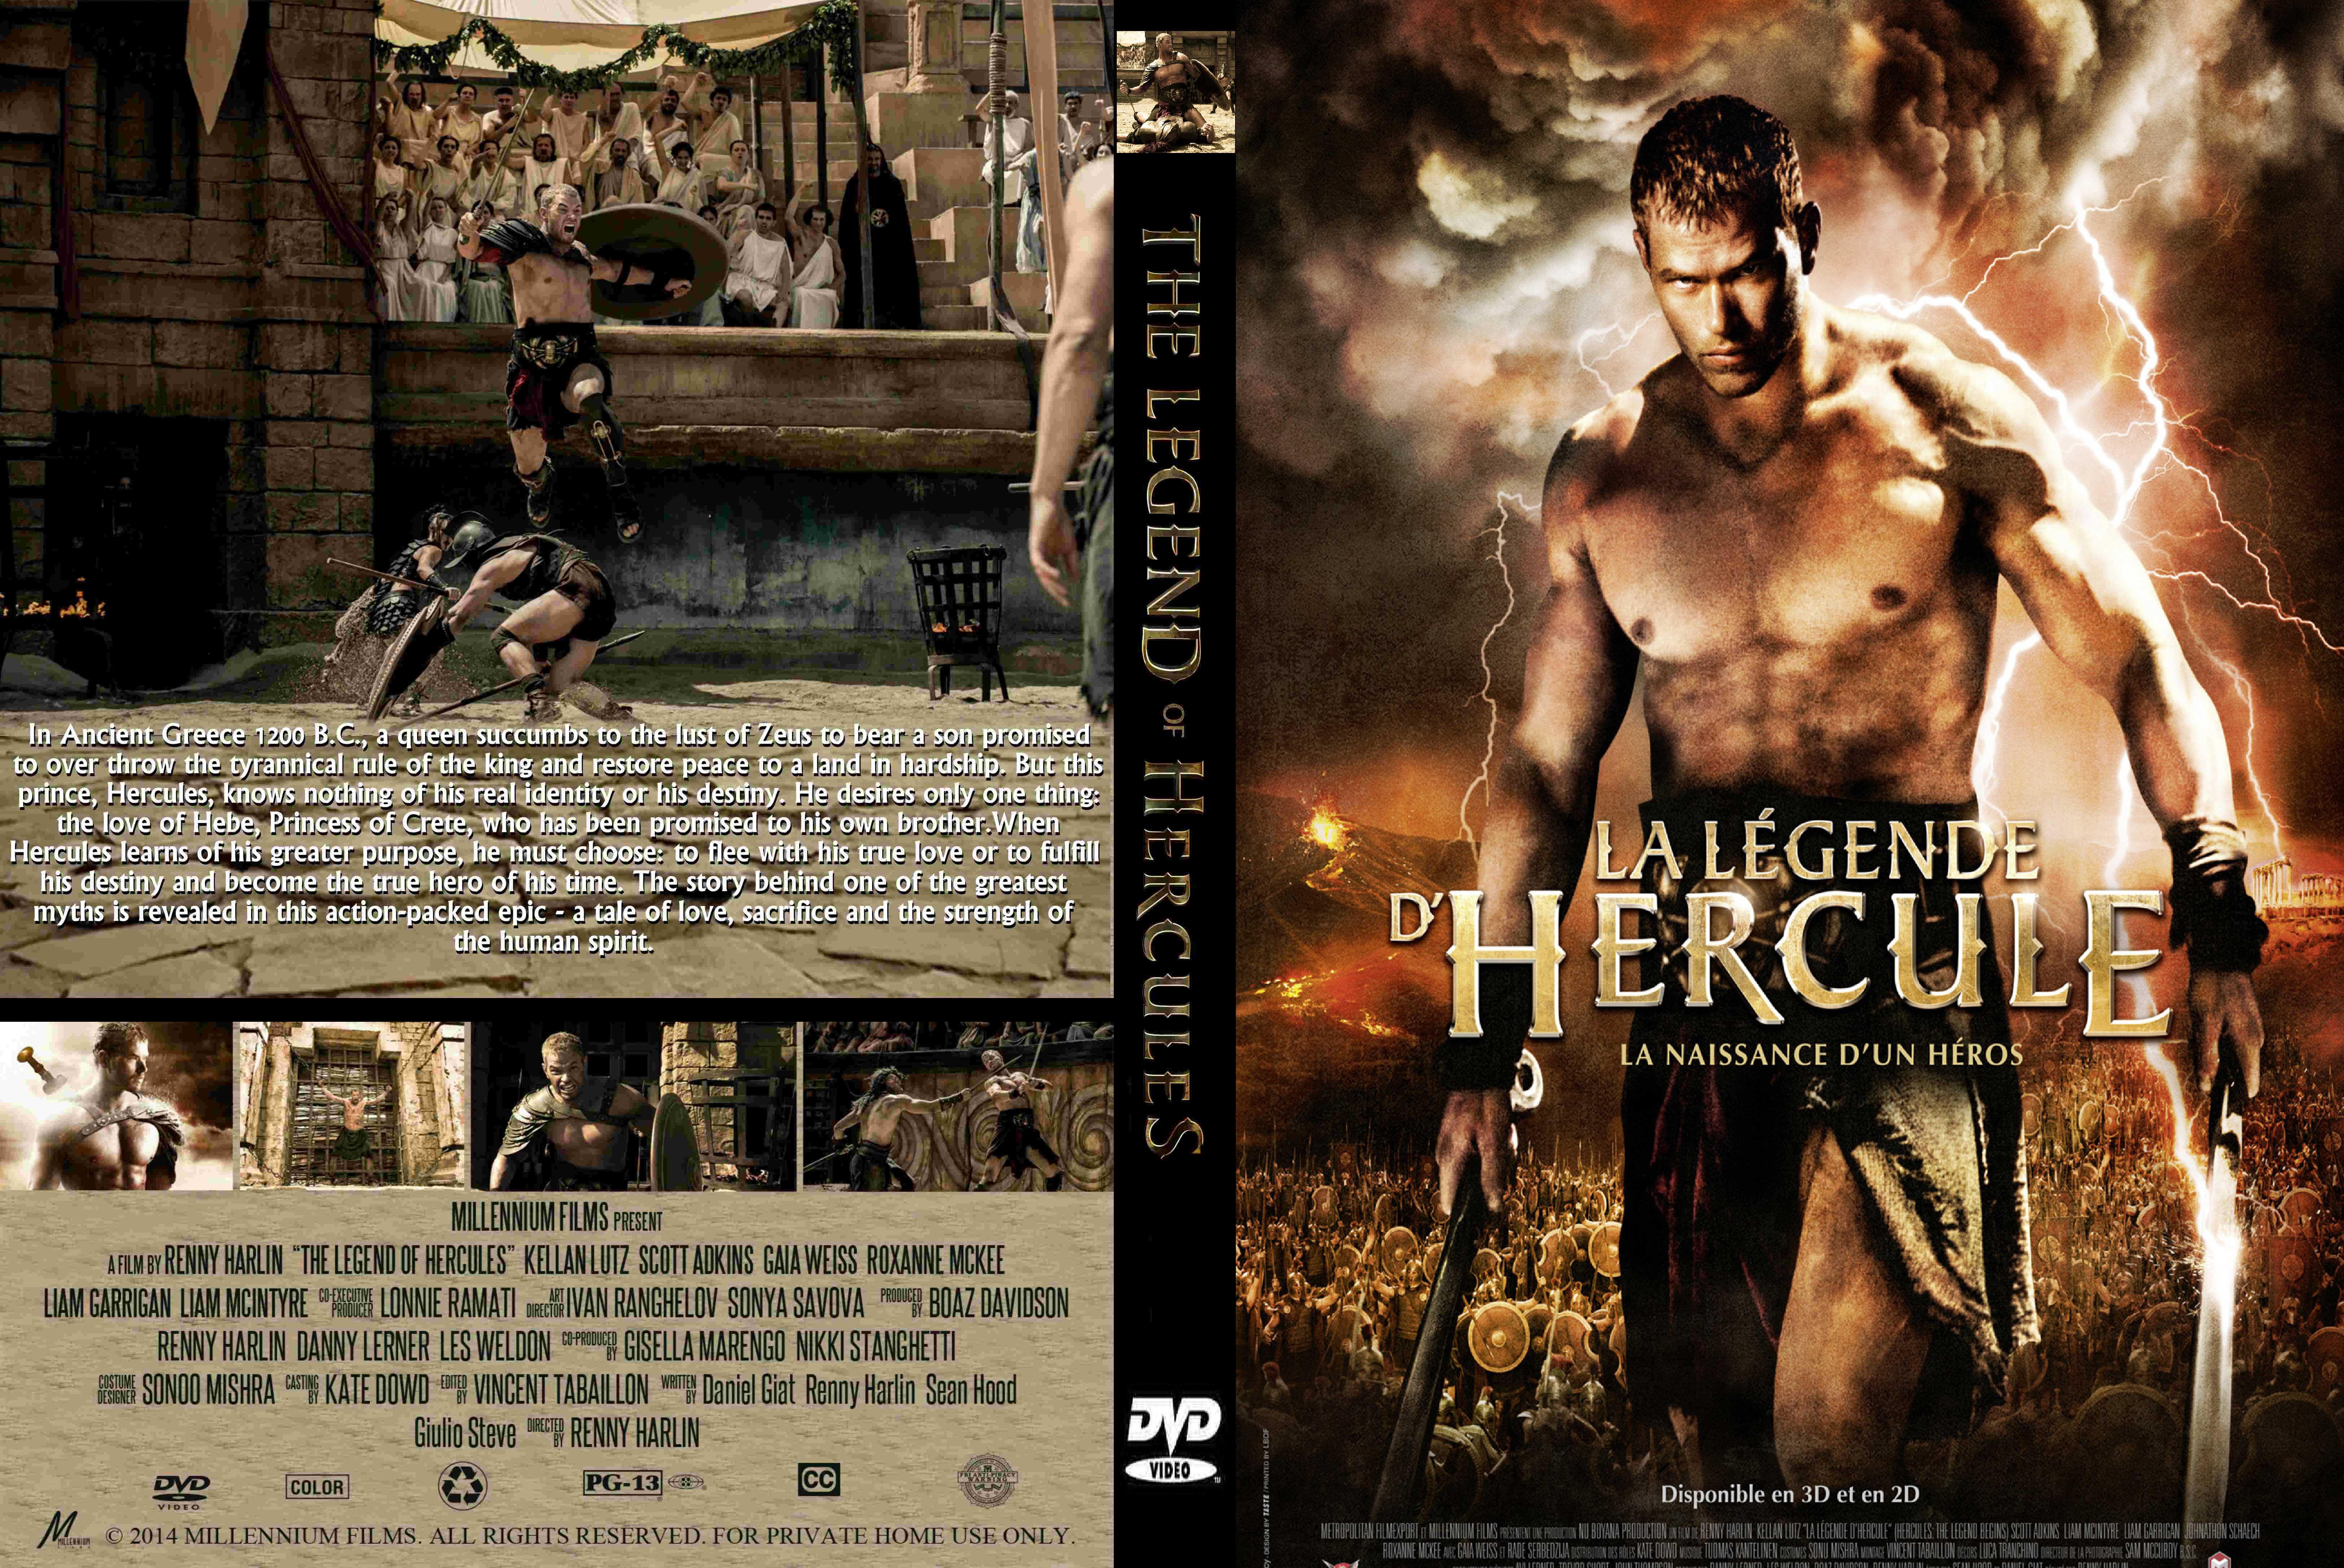 The Legend Of Hercules (2014) Dvd Cover | www.pixshark.com ...